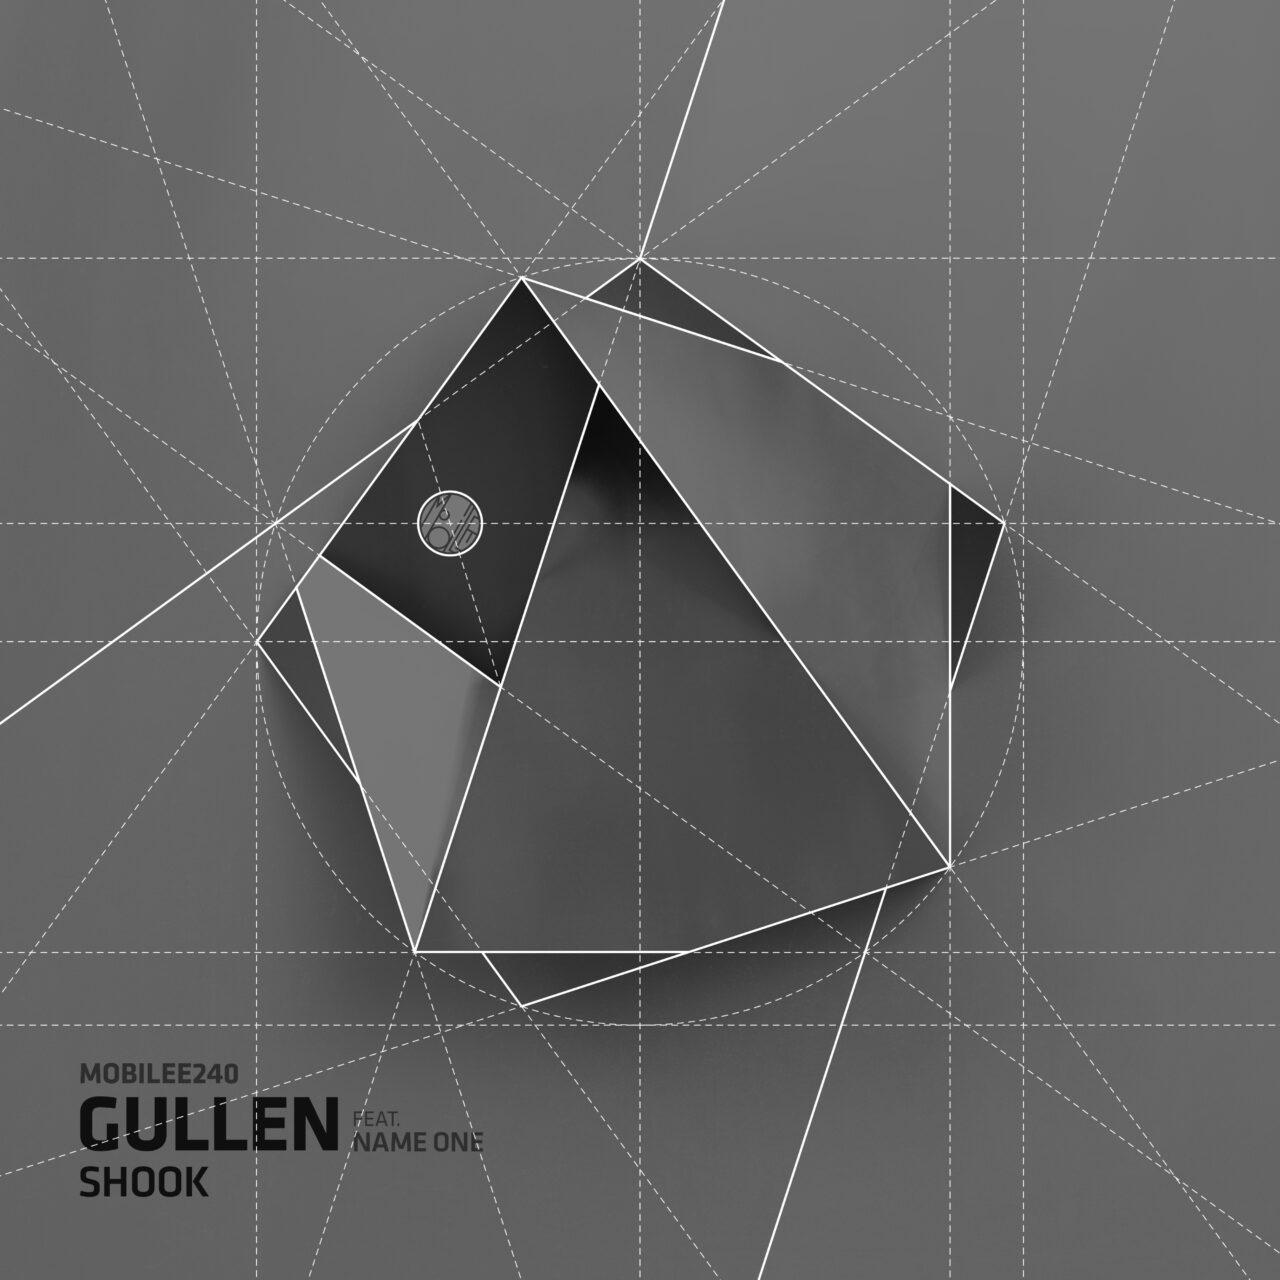 Mobilee240_Gullen_Shook_construction_DEF